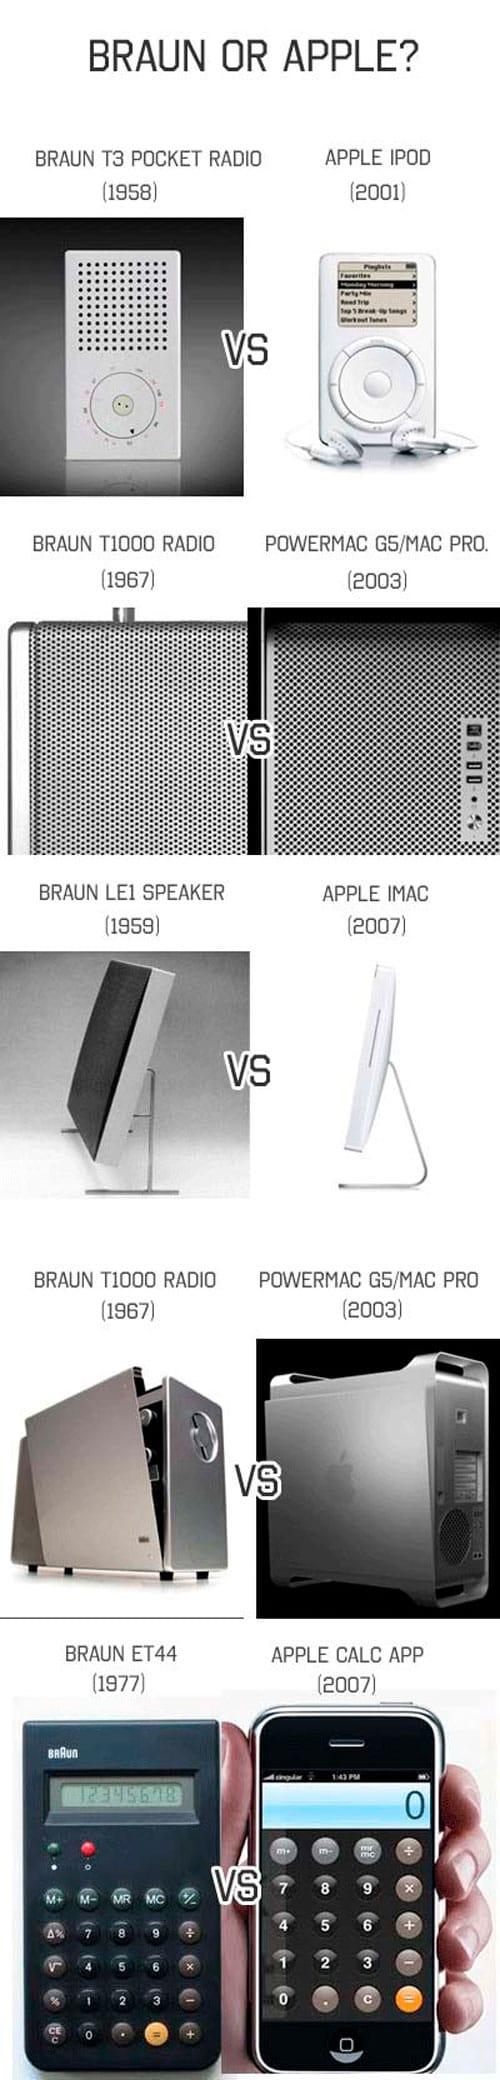 diseno-braun-vs-apple